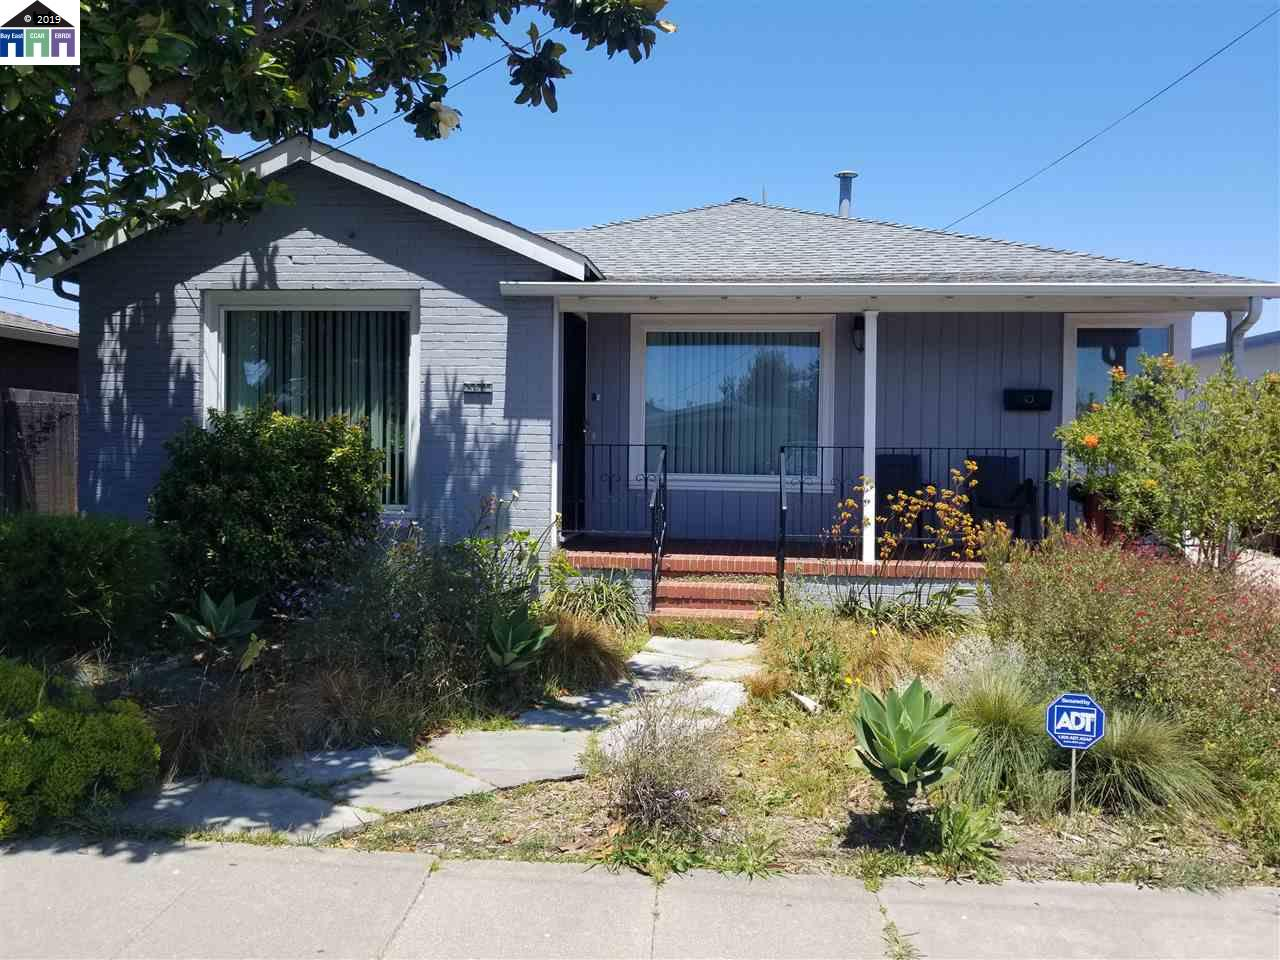 3411 GARVIN AVE, RICHMOND, CA 94805